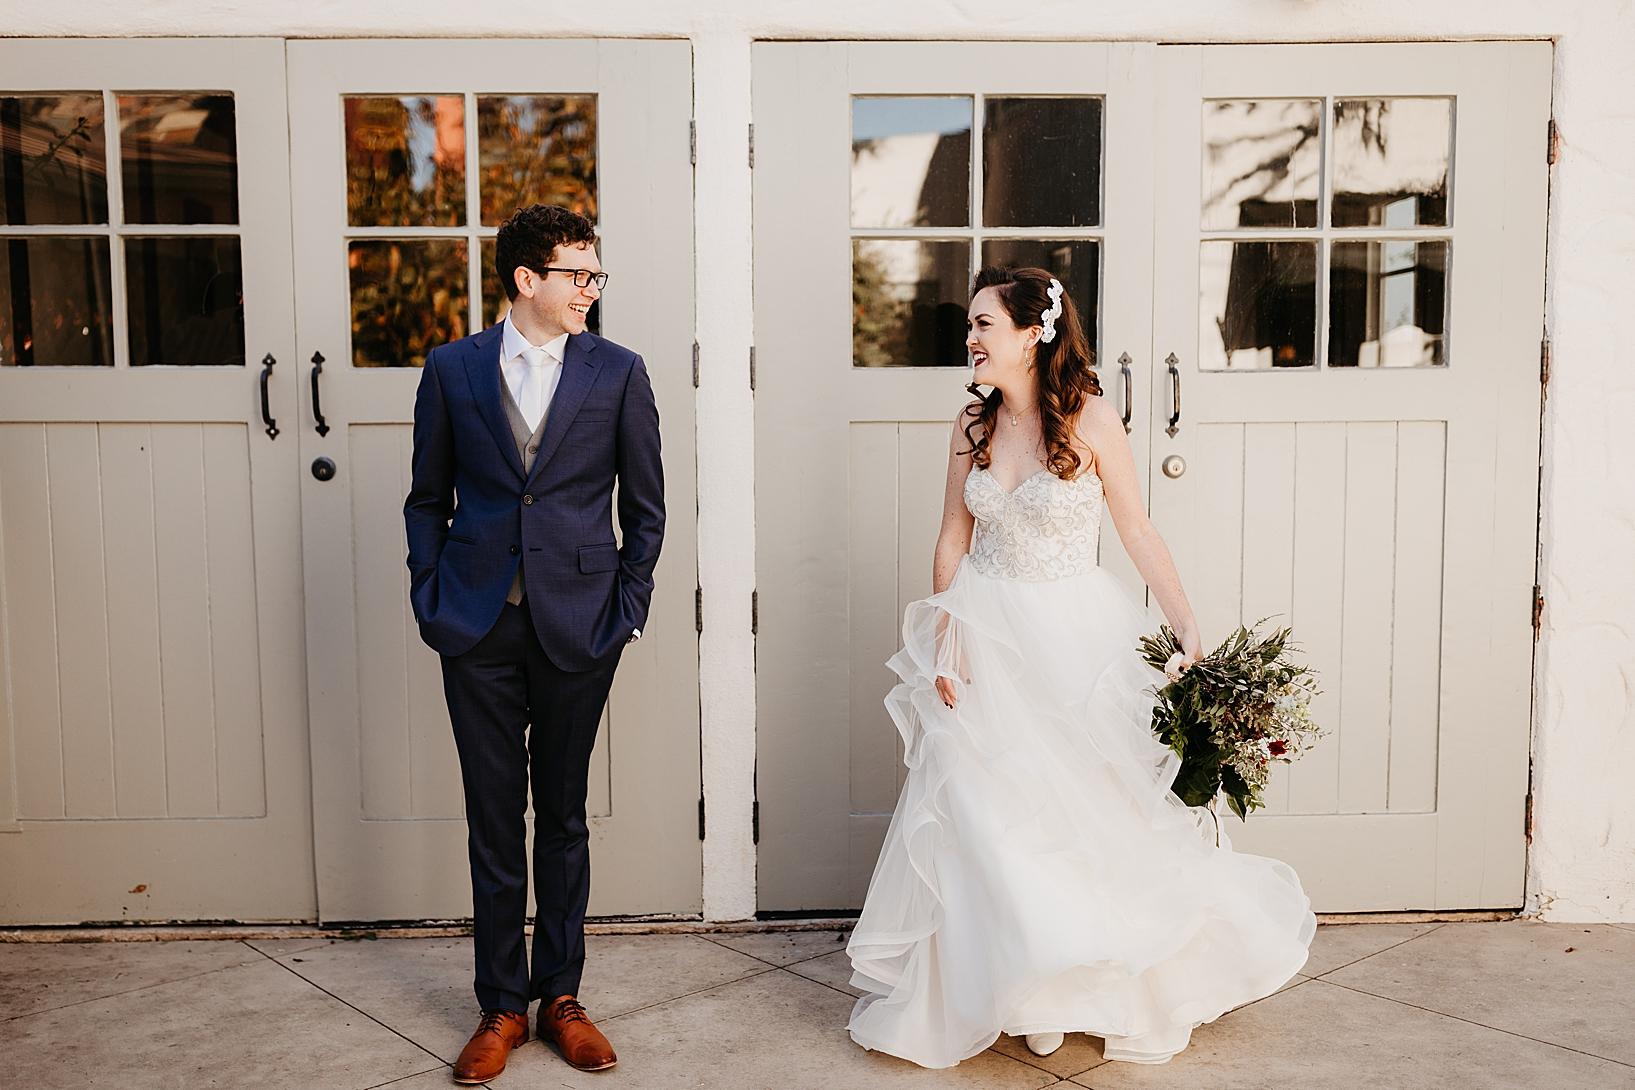 Brick-San-Diego-Winter-Wedding-19.jpg